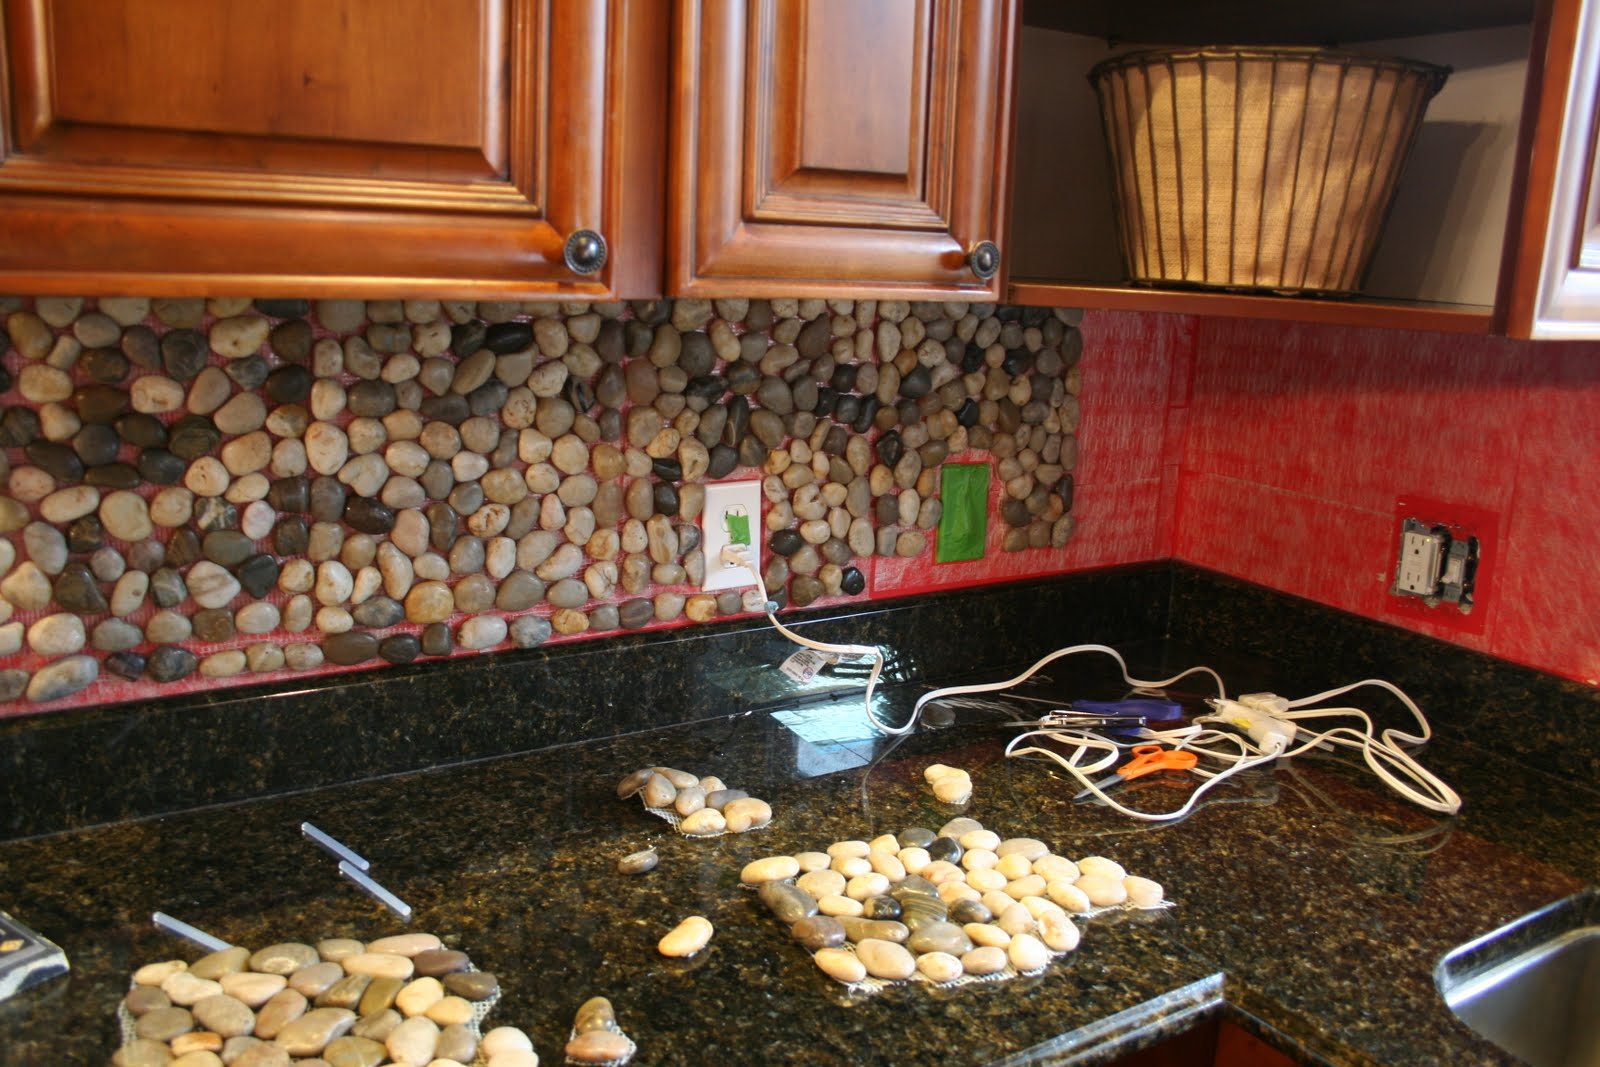 Pebble stone kitchen backsplash pattern.